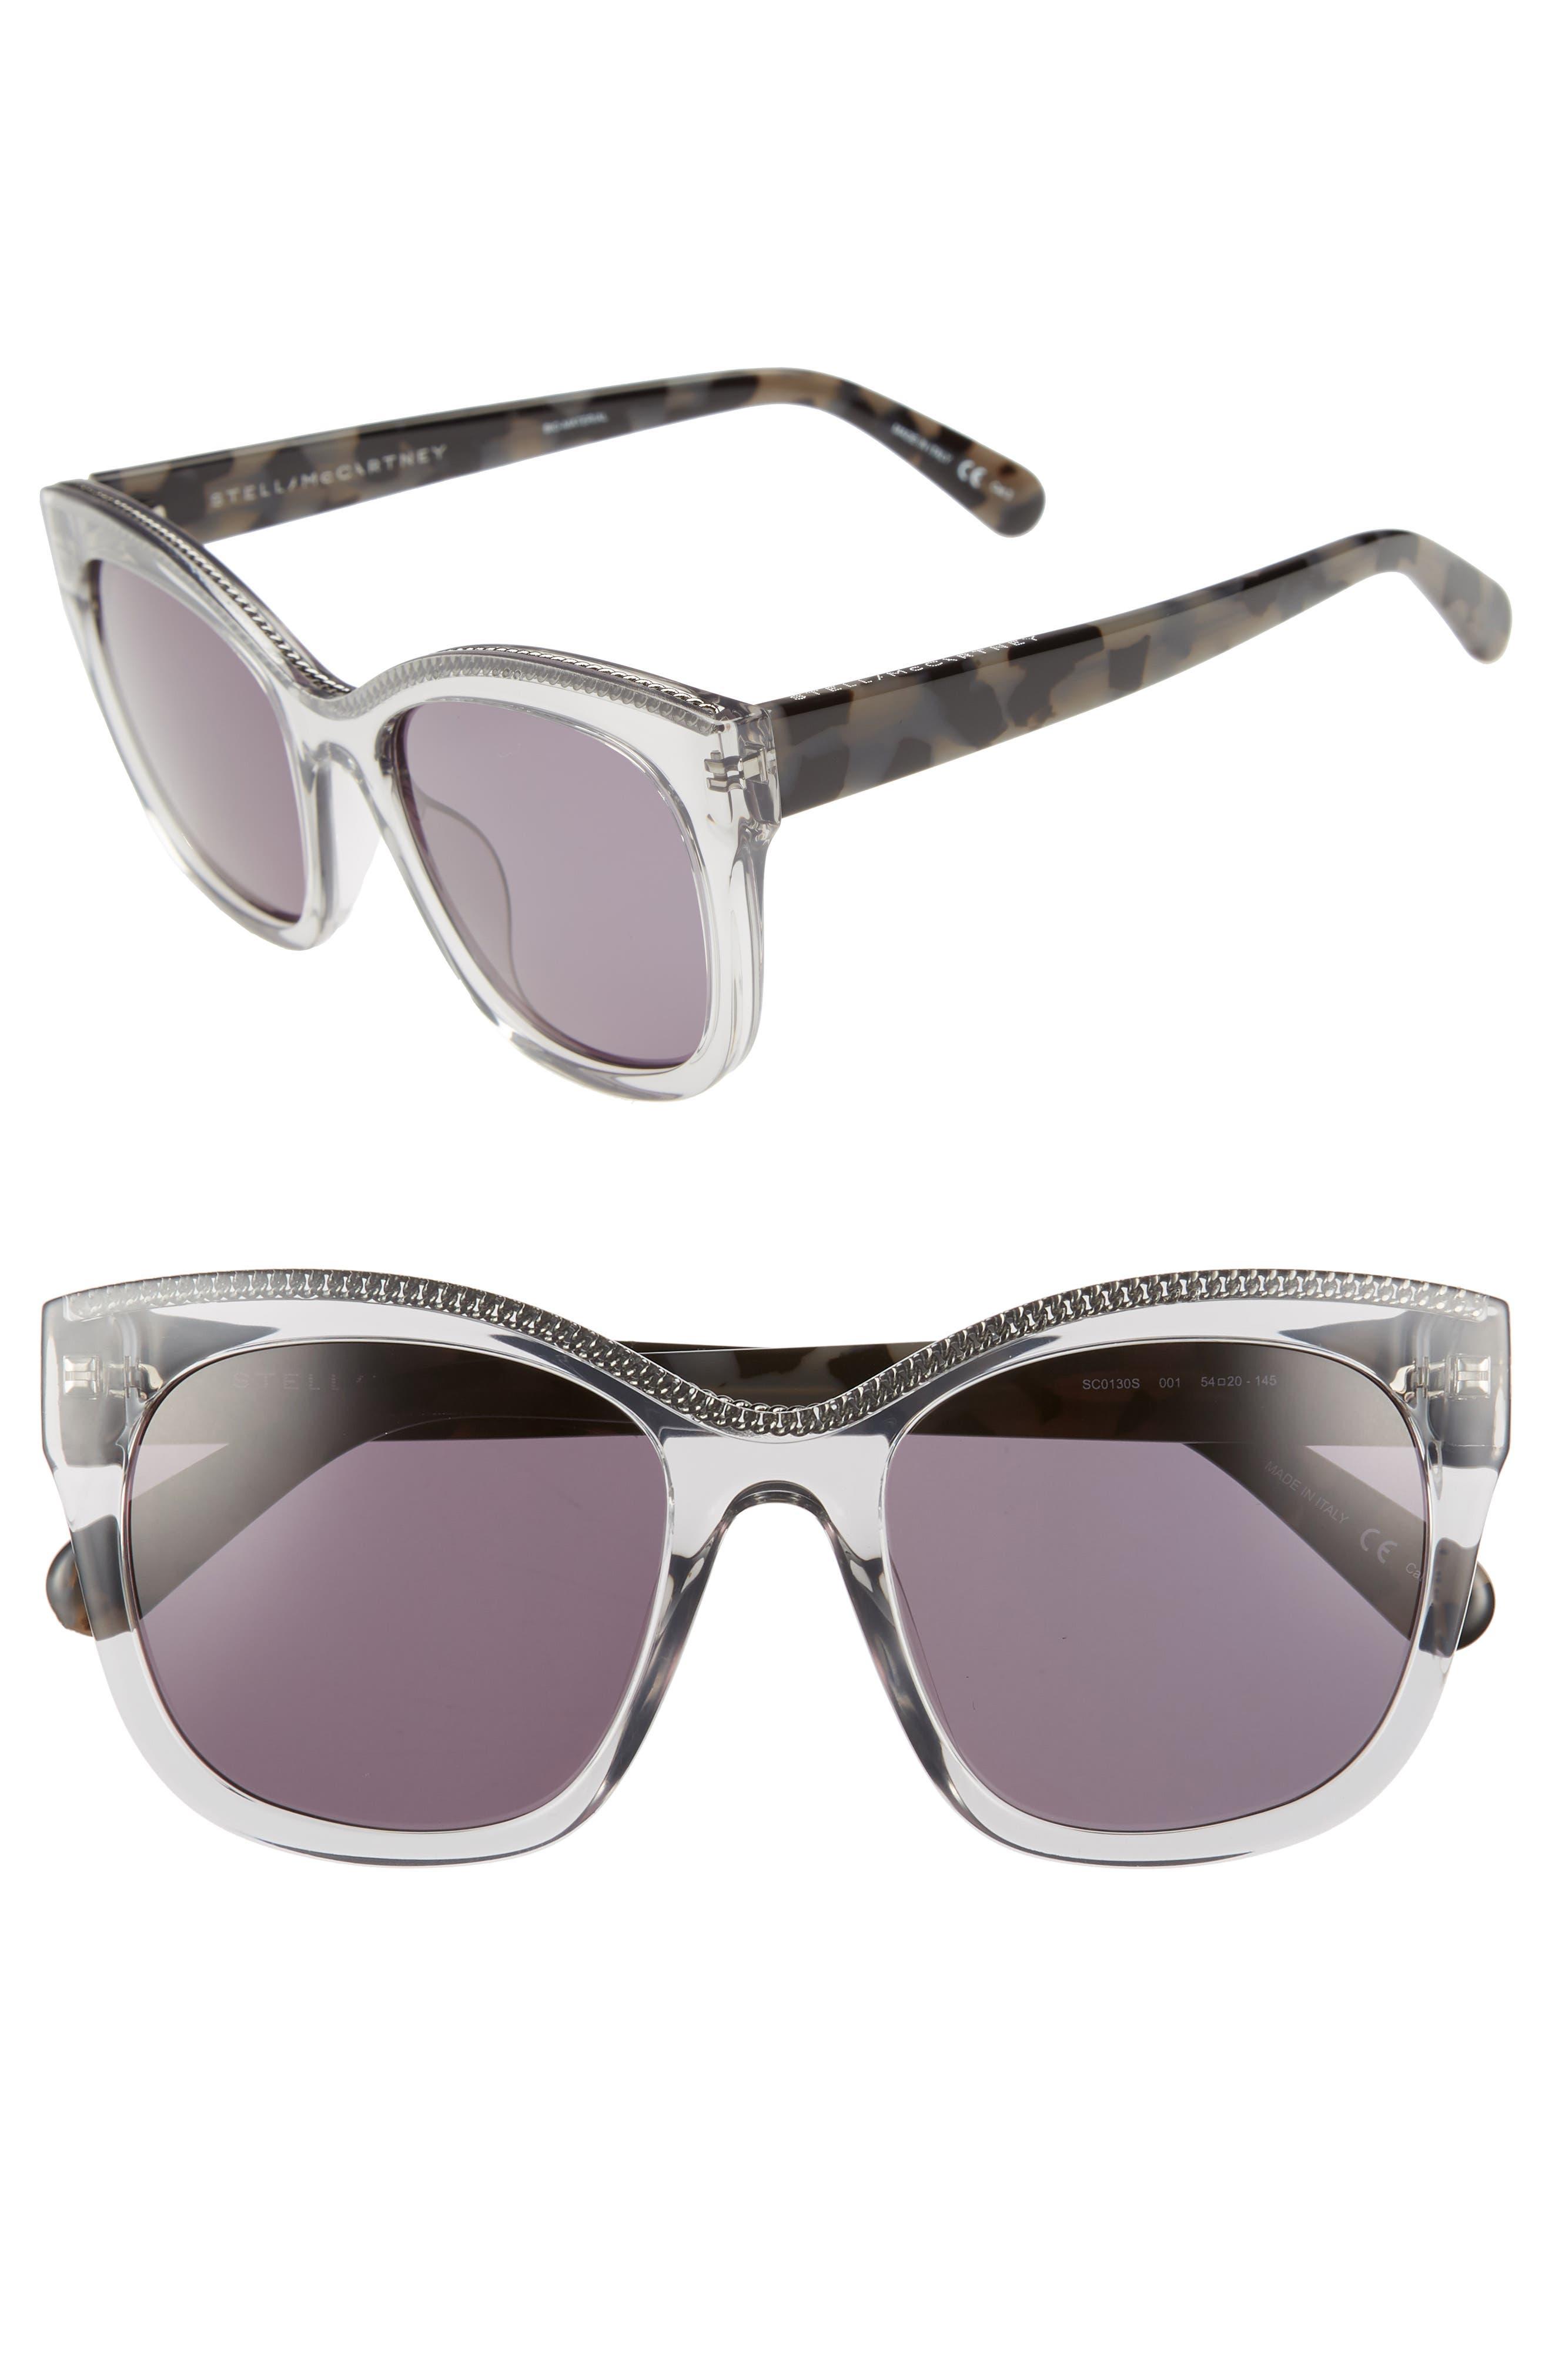 54mm Sunglasses,                         Main,                         color, GREY HAVANA